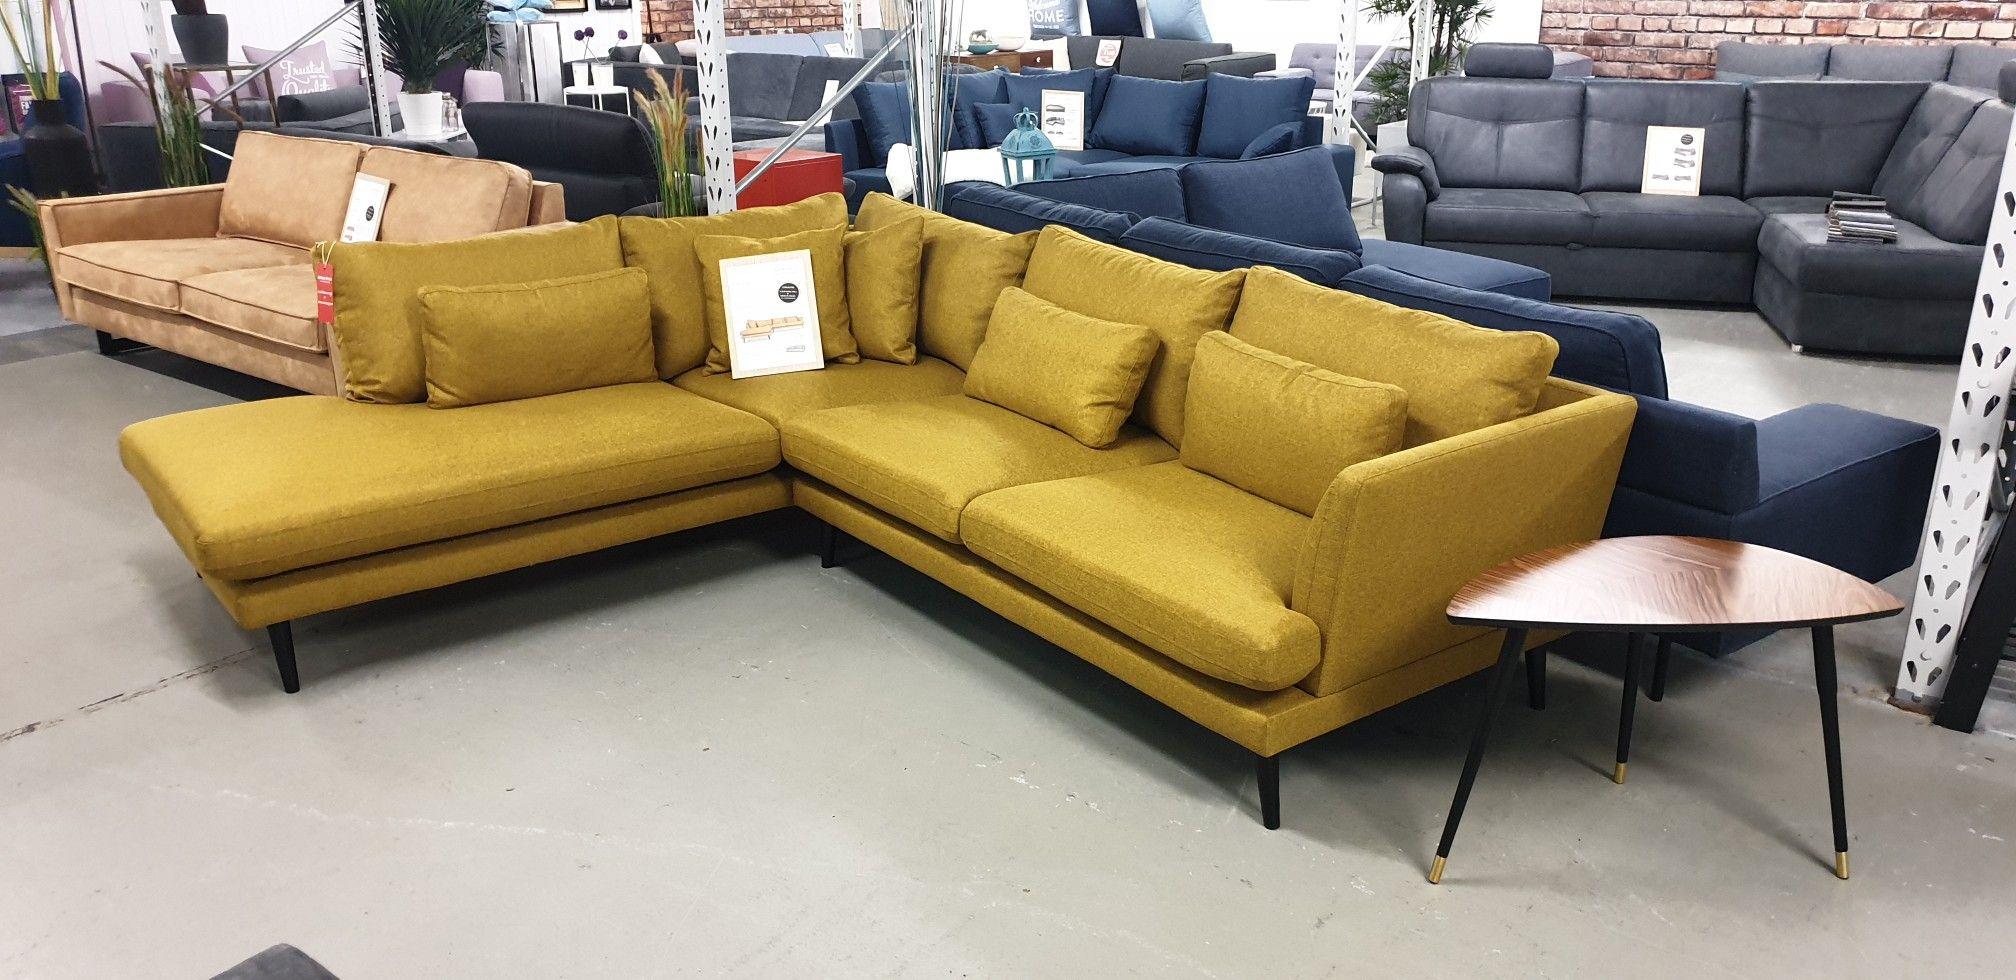 Pin Von Sofa Depot Gmbh Auf Scandic Sofas Https Sofadepot De Skandinavische Sofas In 2020 Ecksofa Sofa Modern